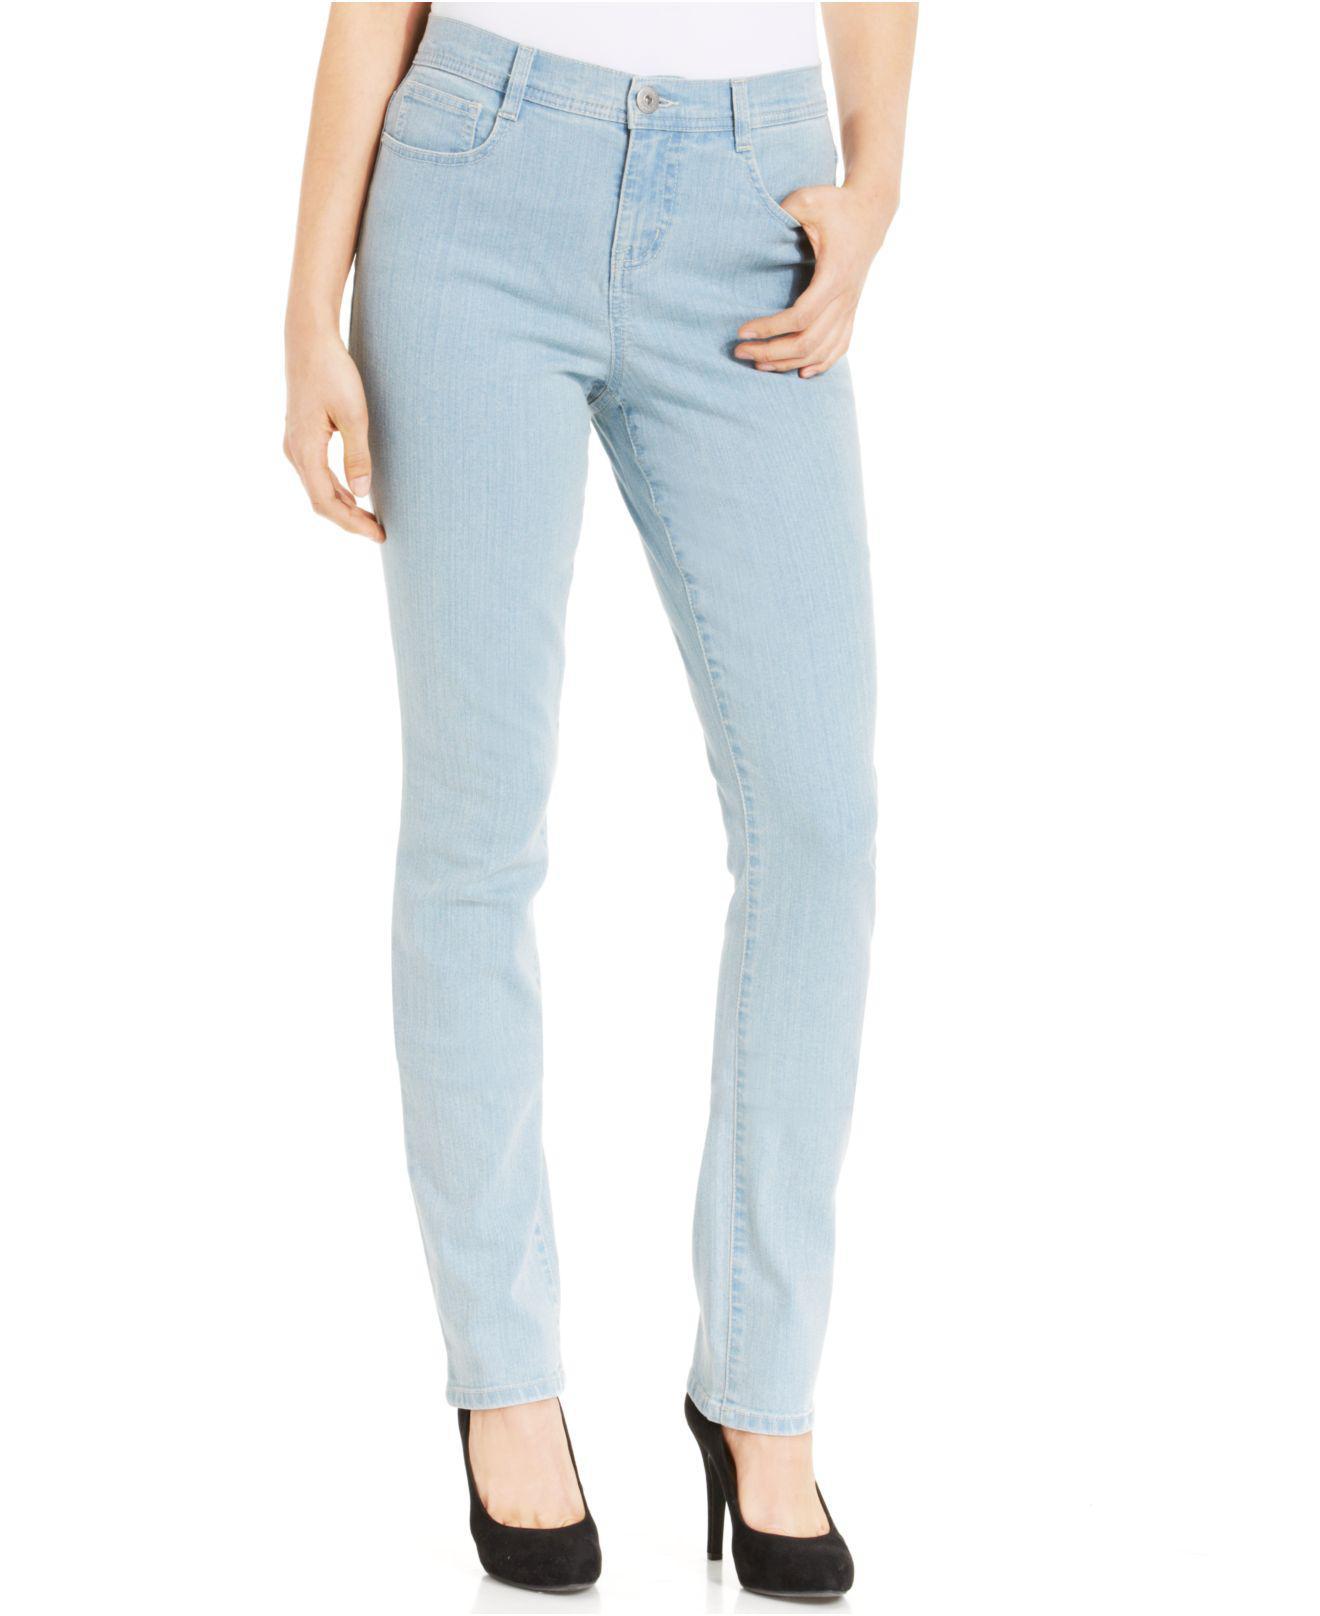 Style /& Co Tummy Control Slim-Leg Jeans,